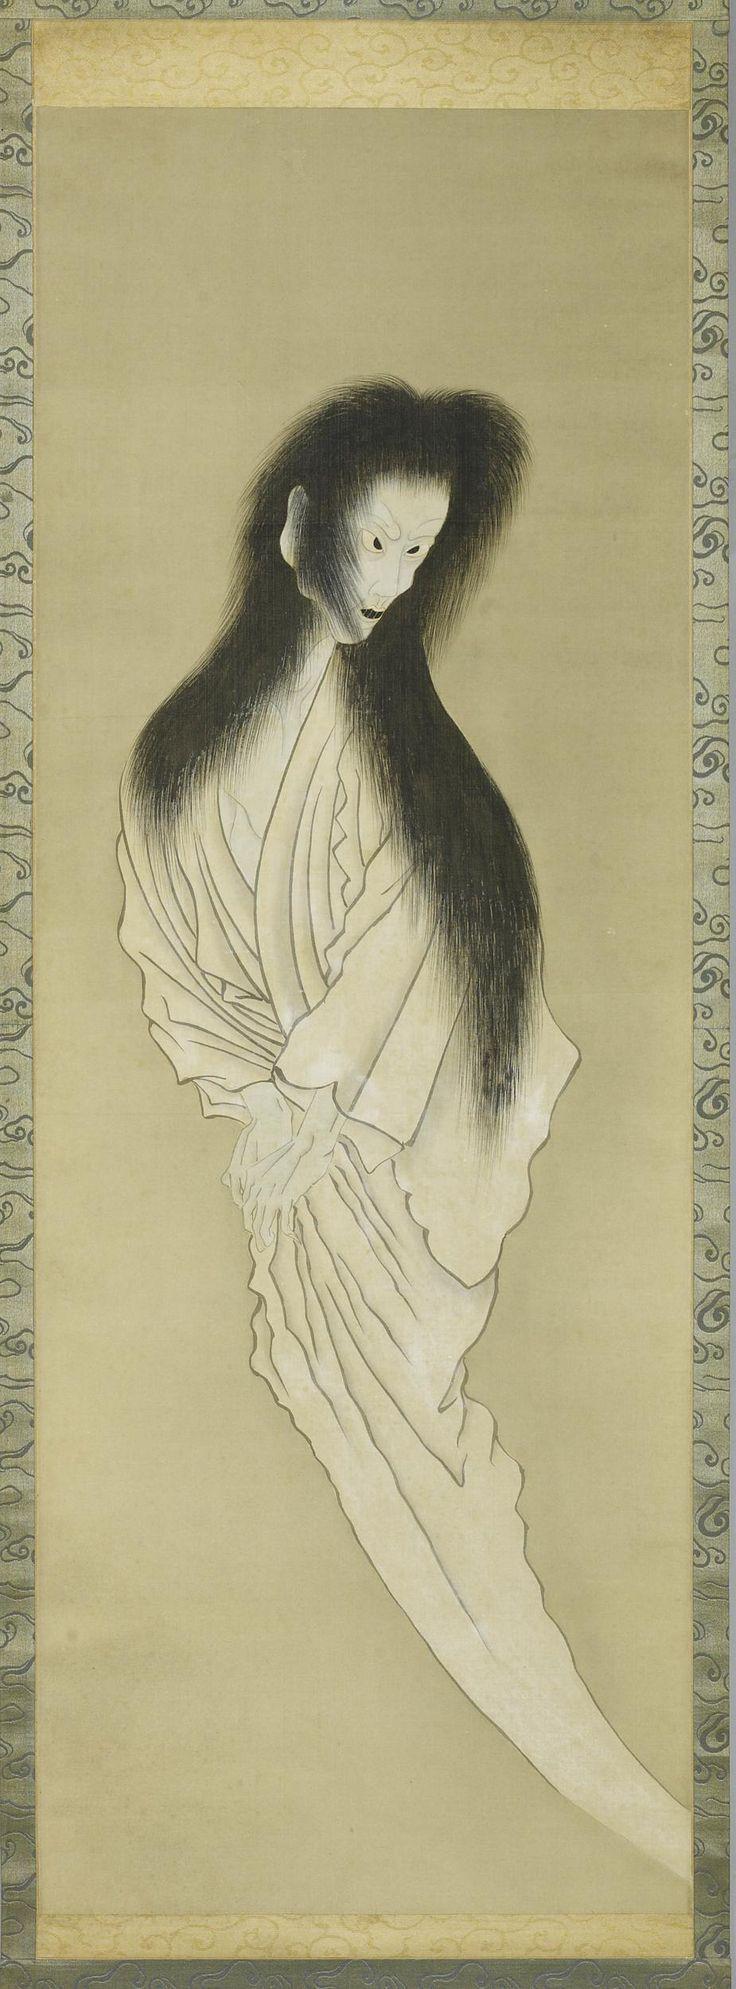 Japanese ghost | Illustration | Pinterest | Supernatural ...